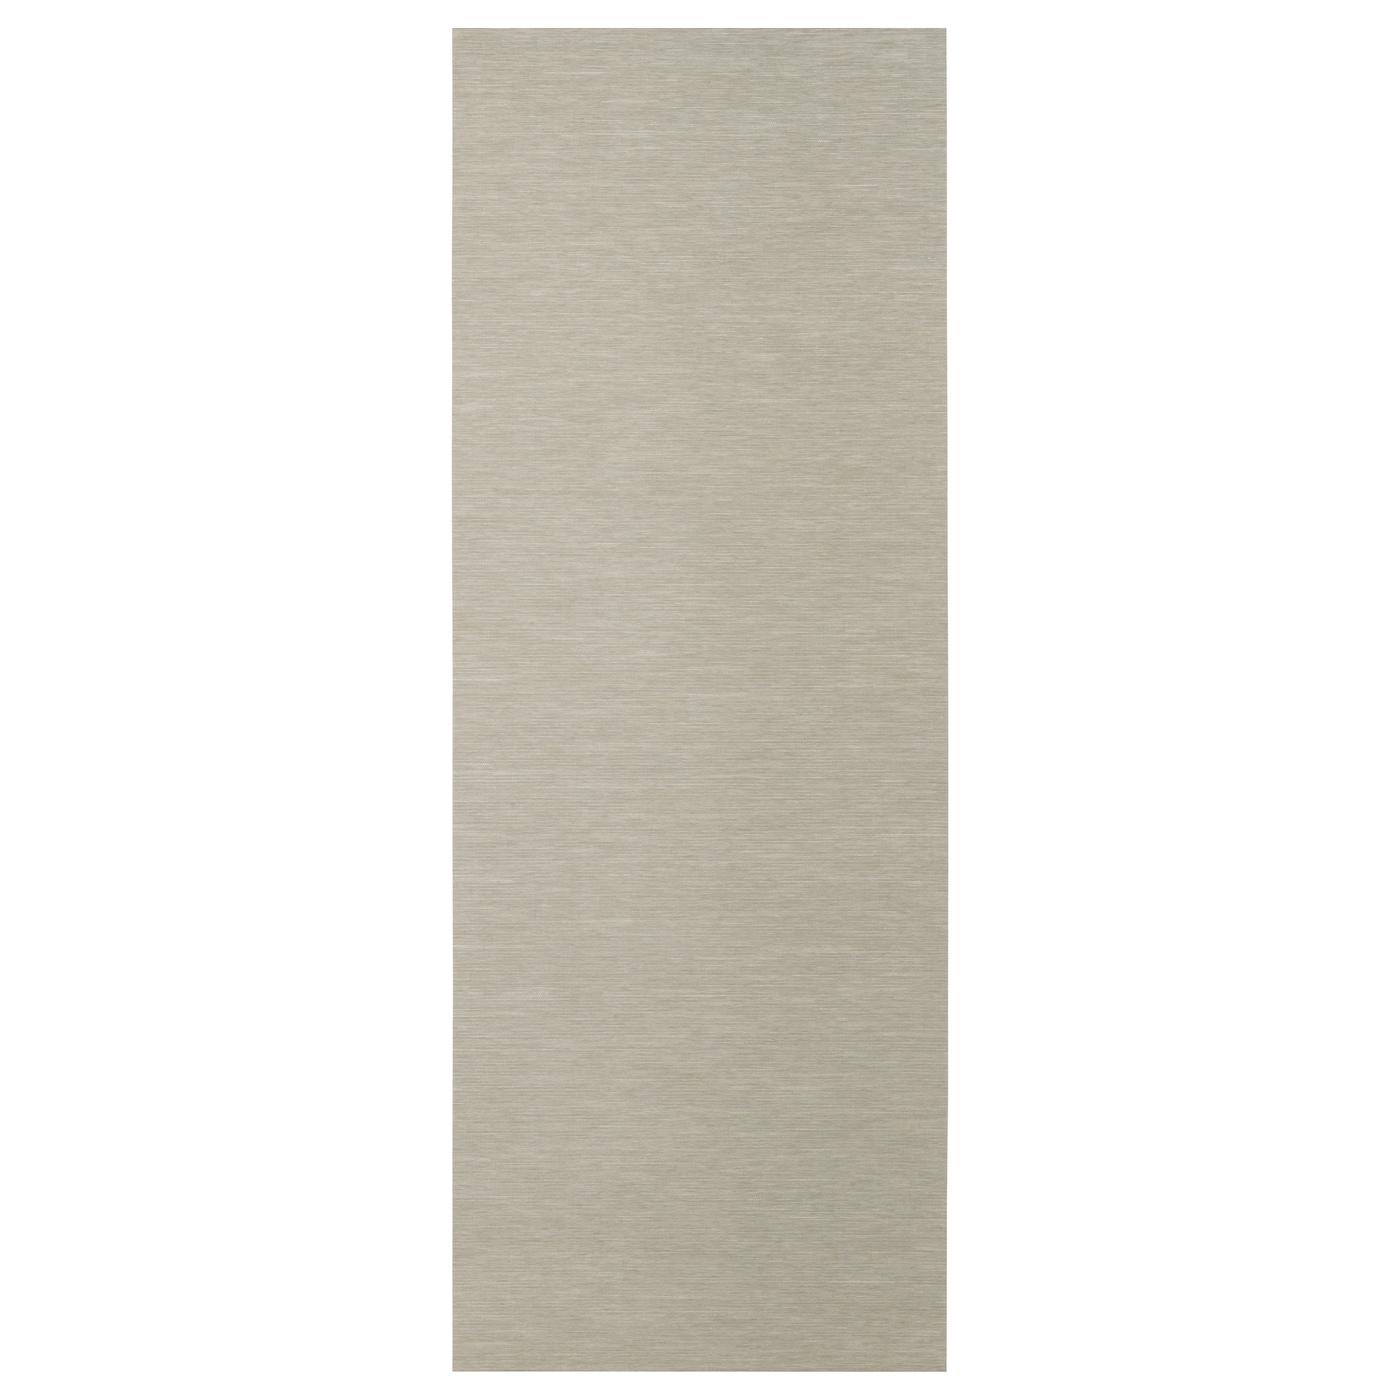 anno sanela panel curtain beige 60x300 cm ikea. Black Bedroom Furniture Sets. Home Design Ideas